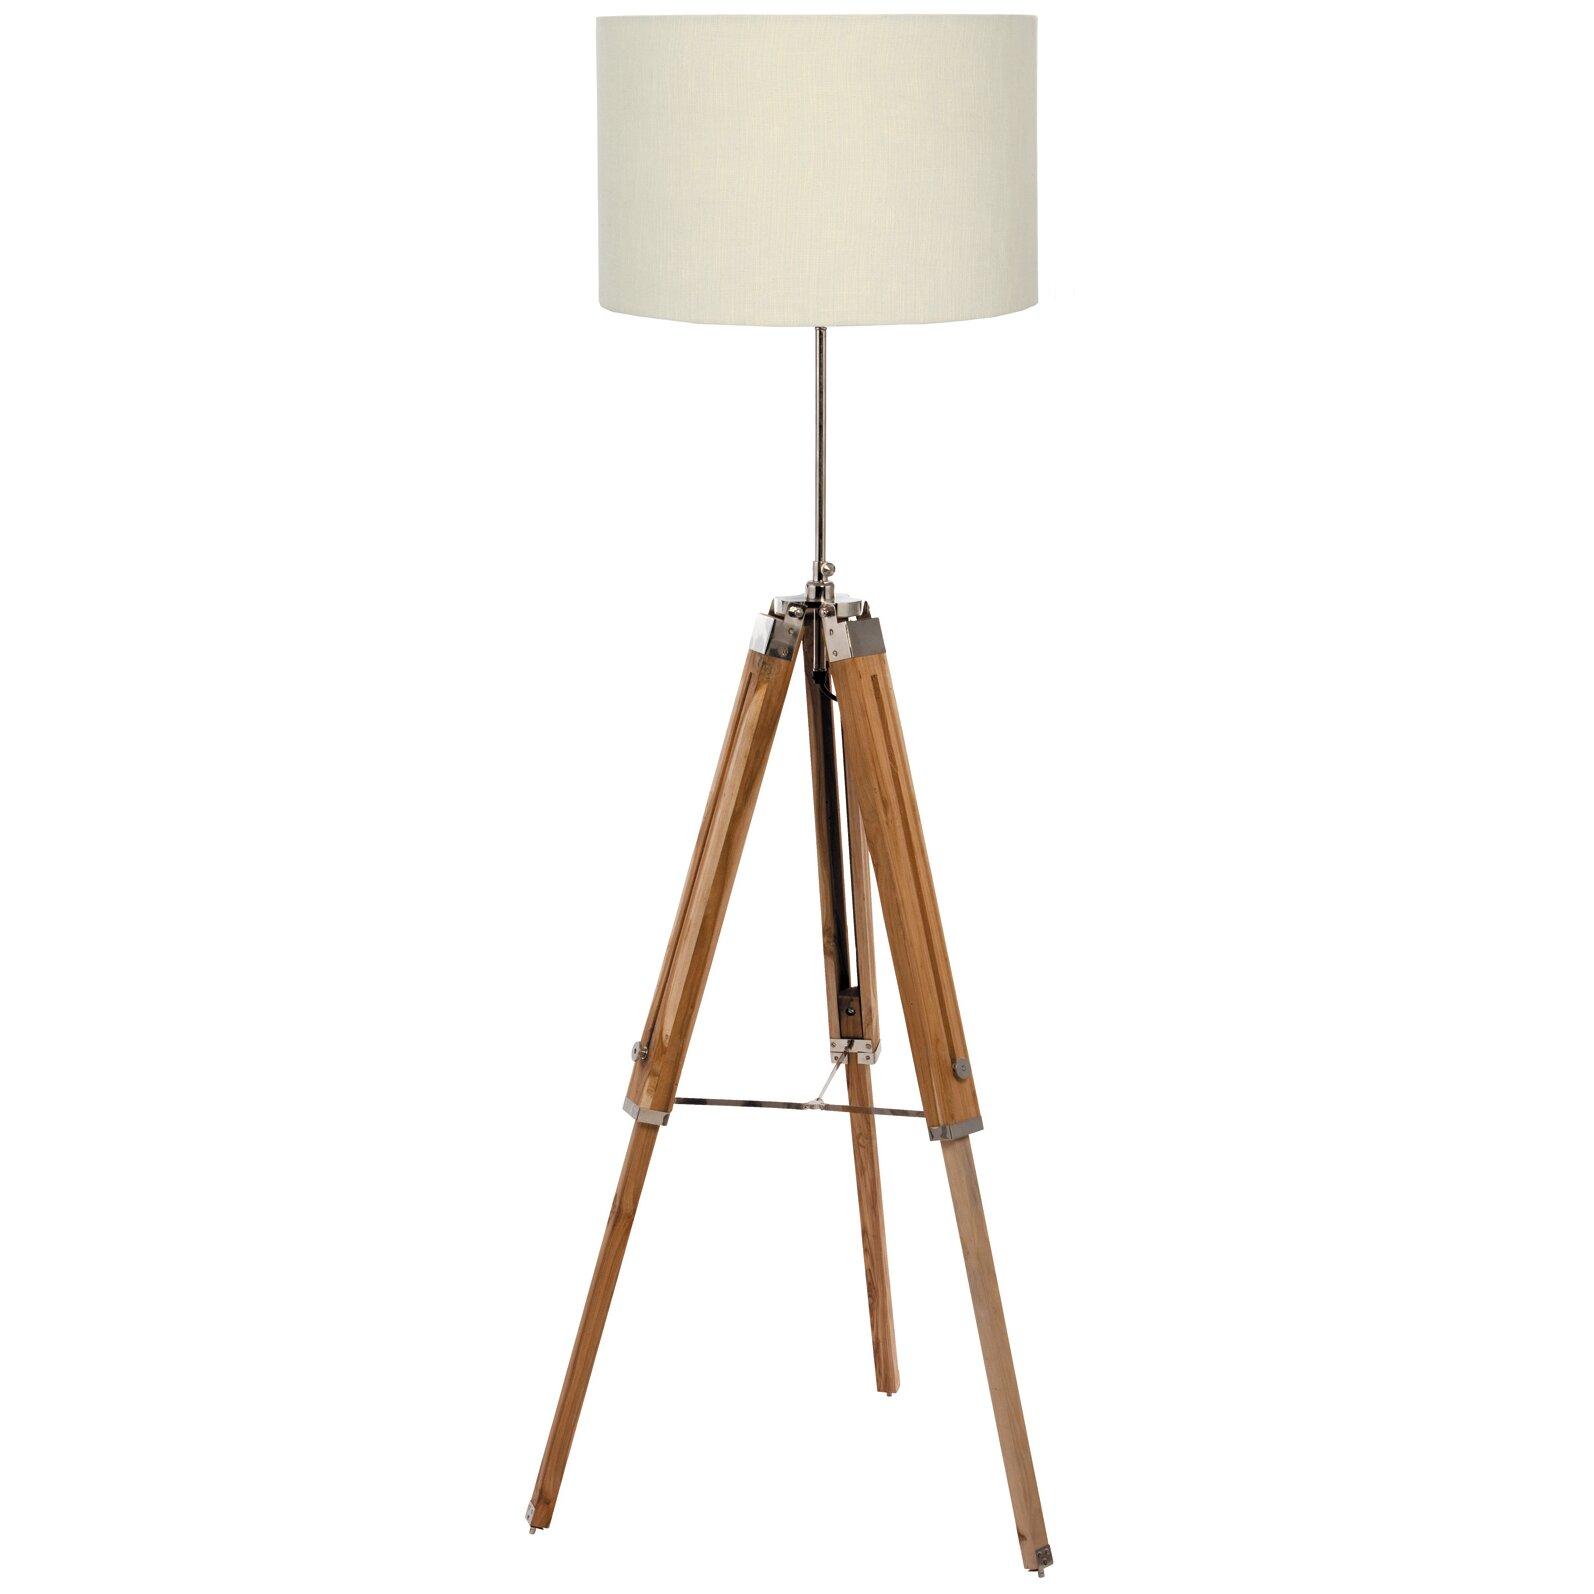 loftdesigns 170 cm tripod stehlampe dinuba bewertungen. Black Bedroom Furniture Sets. Home Design Ideas